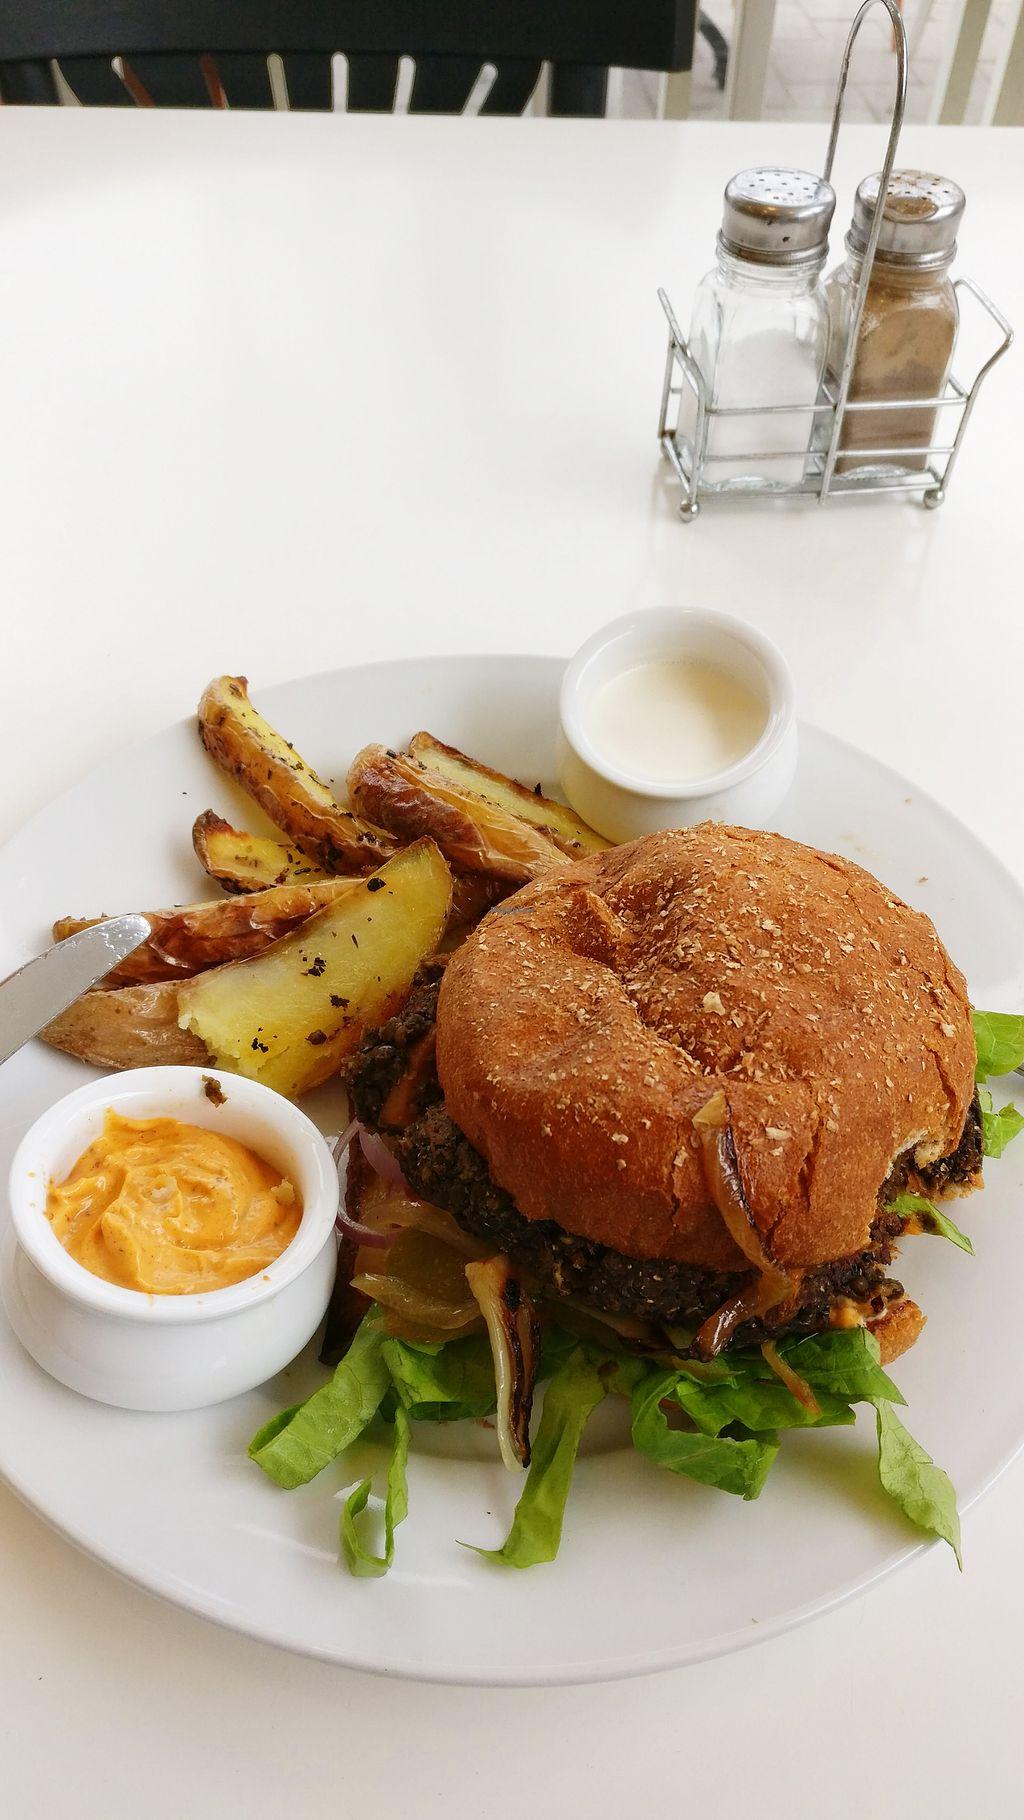 "Photo of Buddha Burgers  by <a href=""/members/profile/KarinKoala"">KarinKoala</a> <br/>Amazing vegan burger at yokneam Buddha burger  <br/> April 1, 2018  - <a href='/contact/abuse/image/53505/379261'>Report</a>"